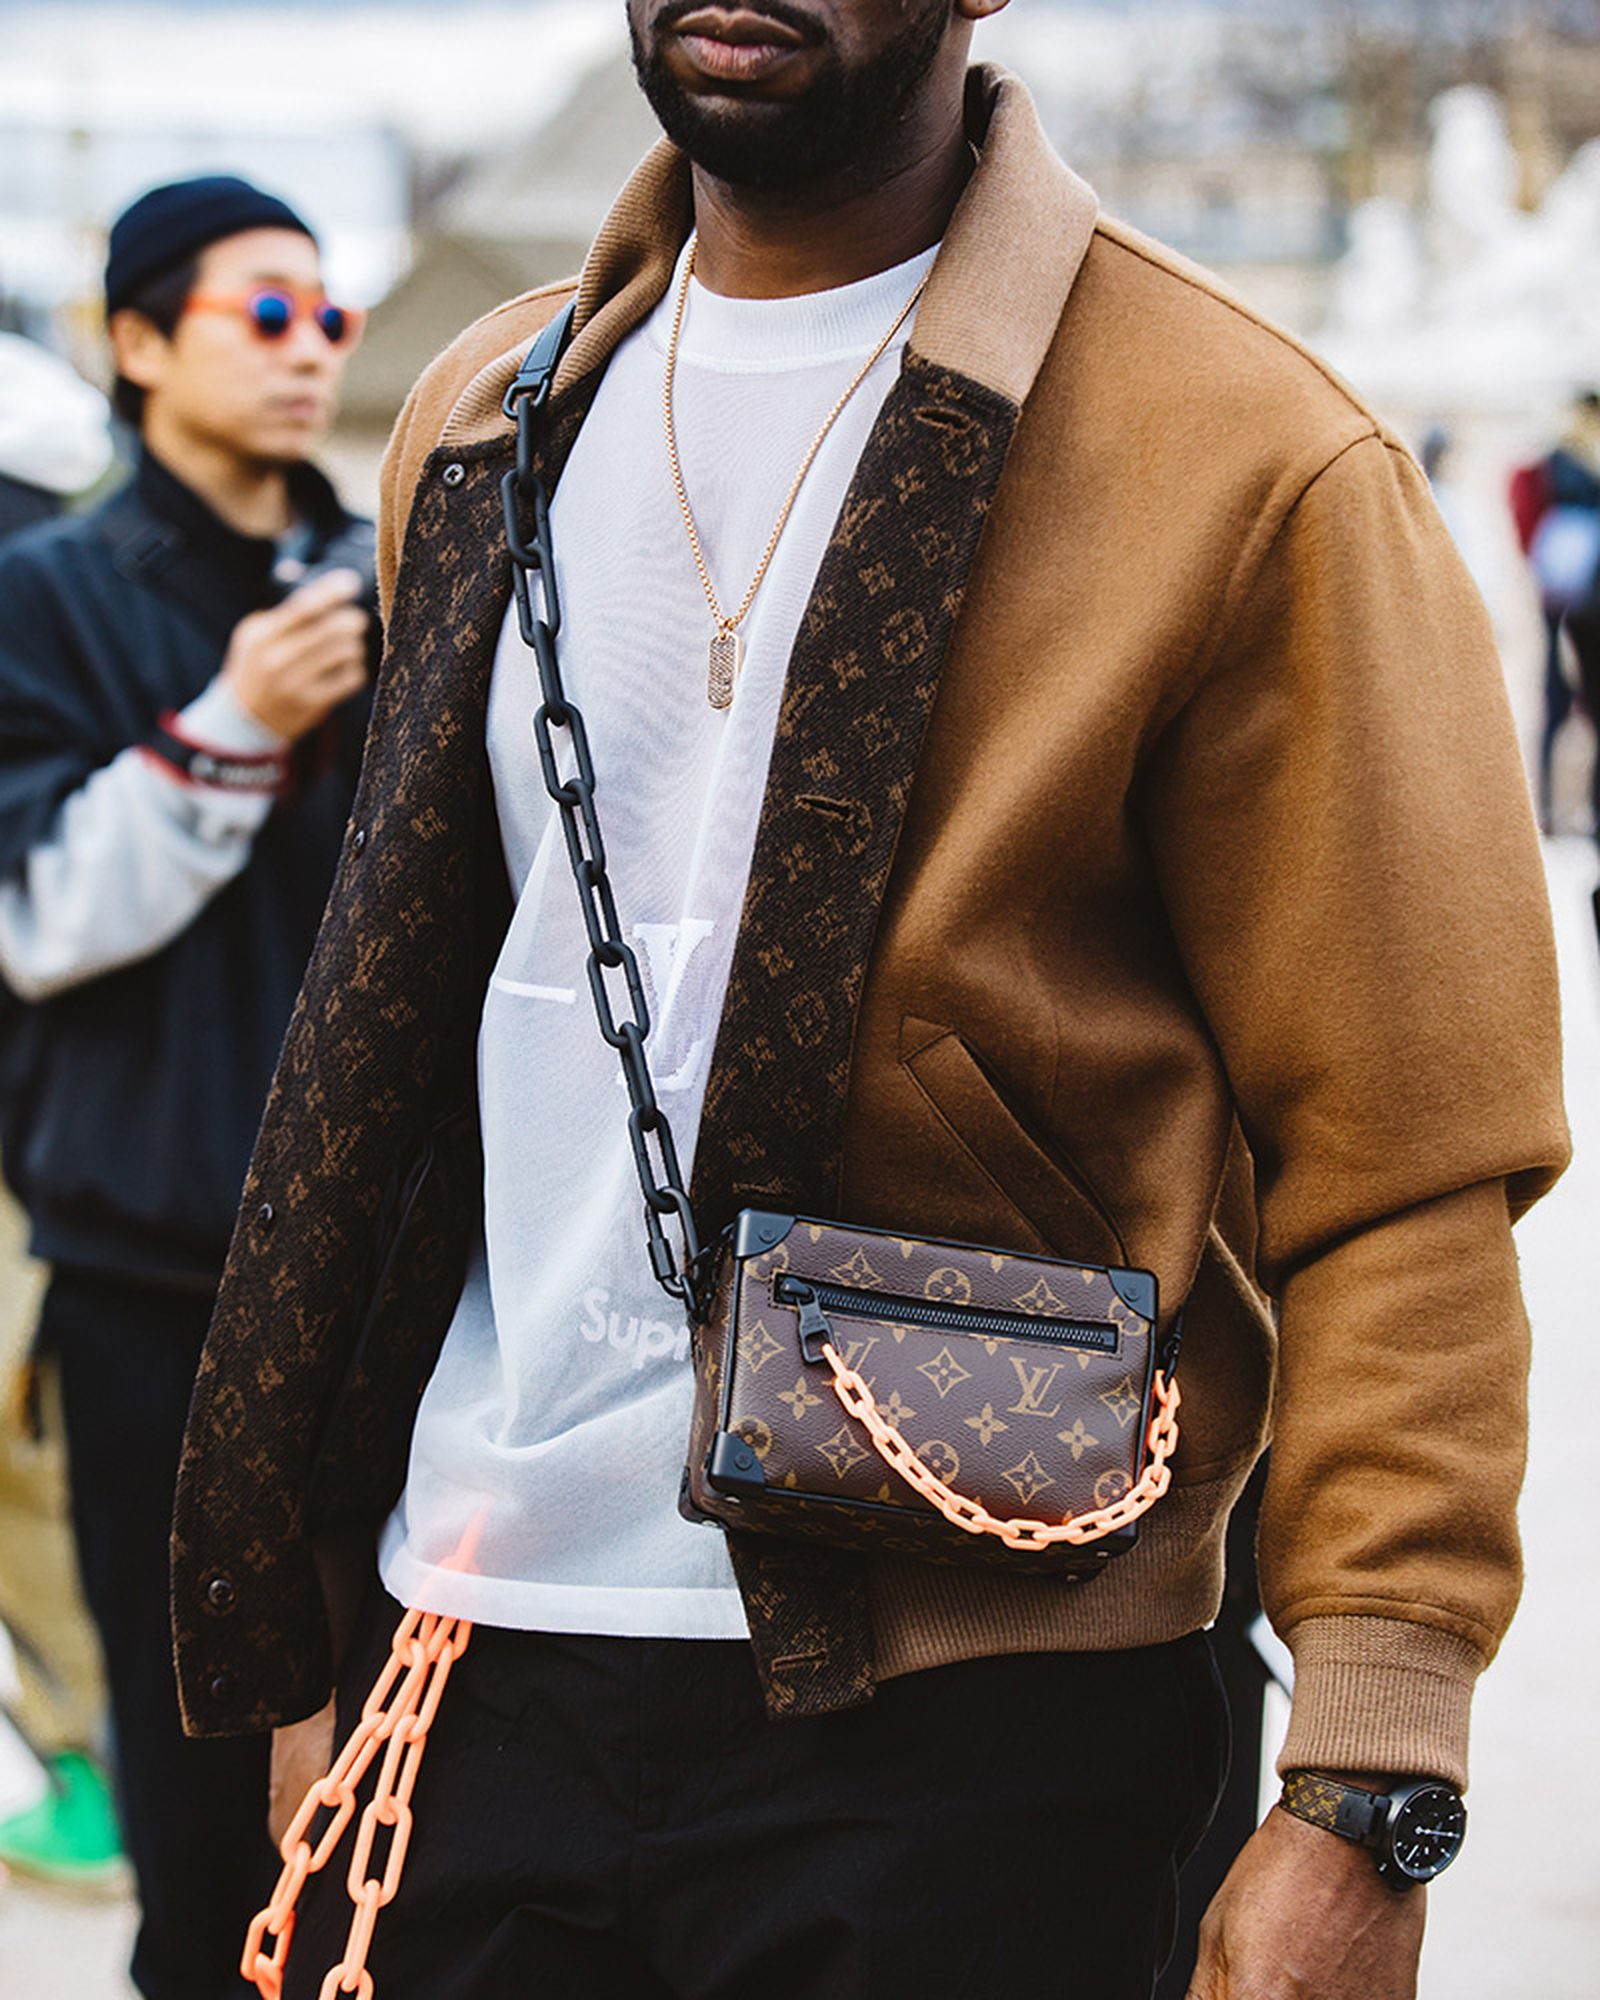 12_HISNO2_Case_Study_Louis_Vuitton_MFW19_Paris_StreetStyle_JulienTell_11